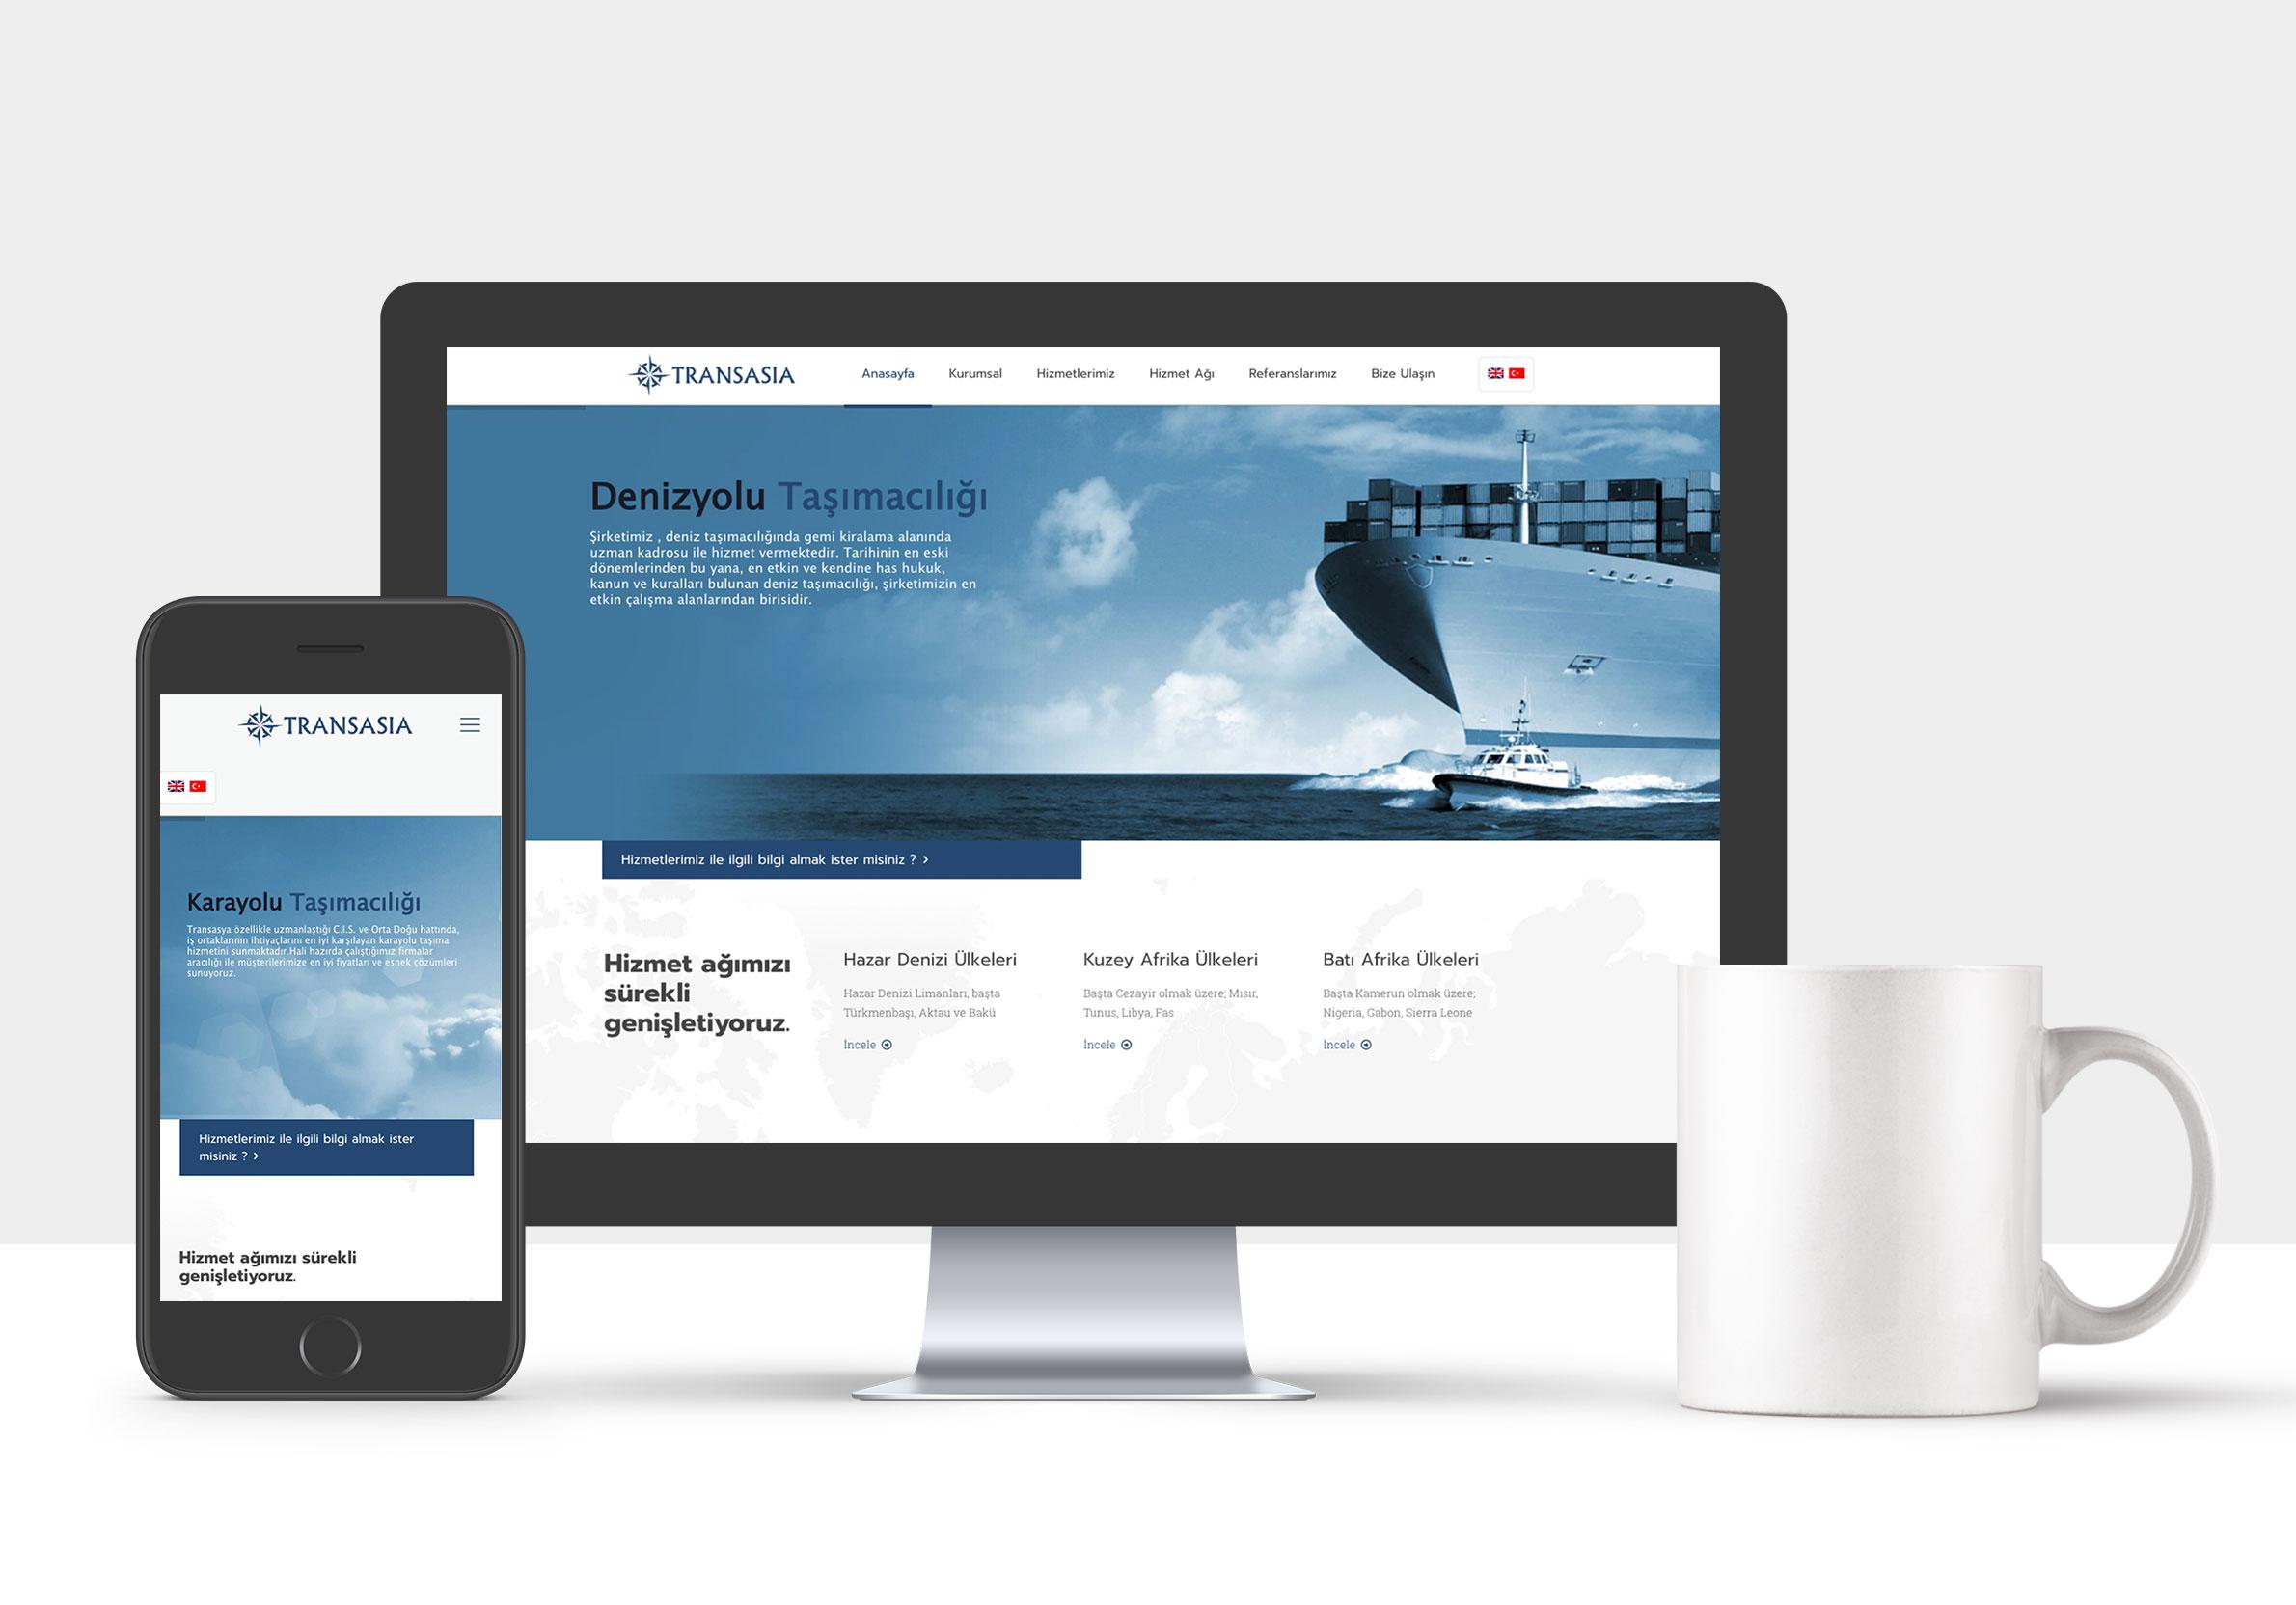 transasia-taşımacilik-kurumsal-web-tasarim.jpg